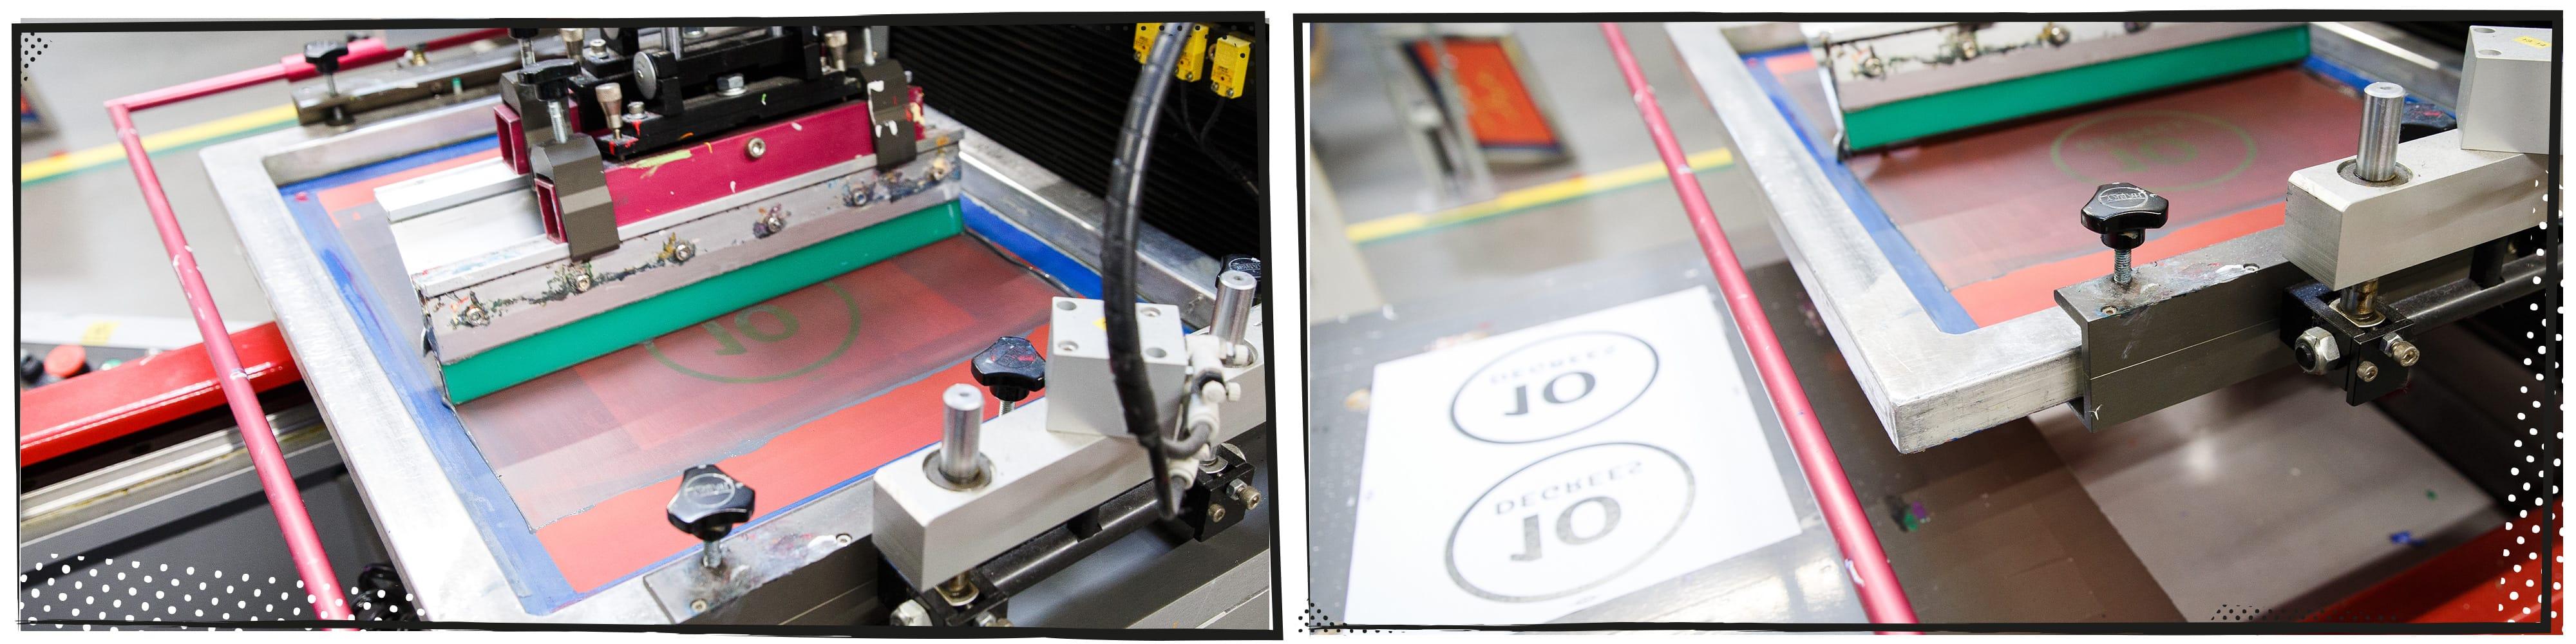 druktechnieken-transferdruk